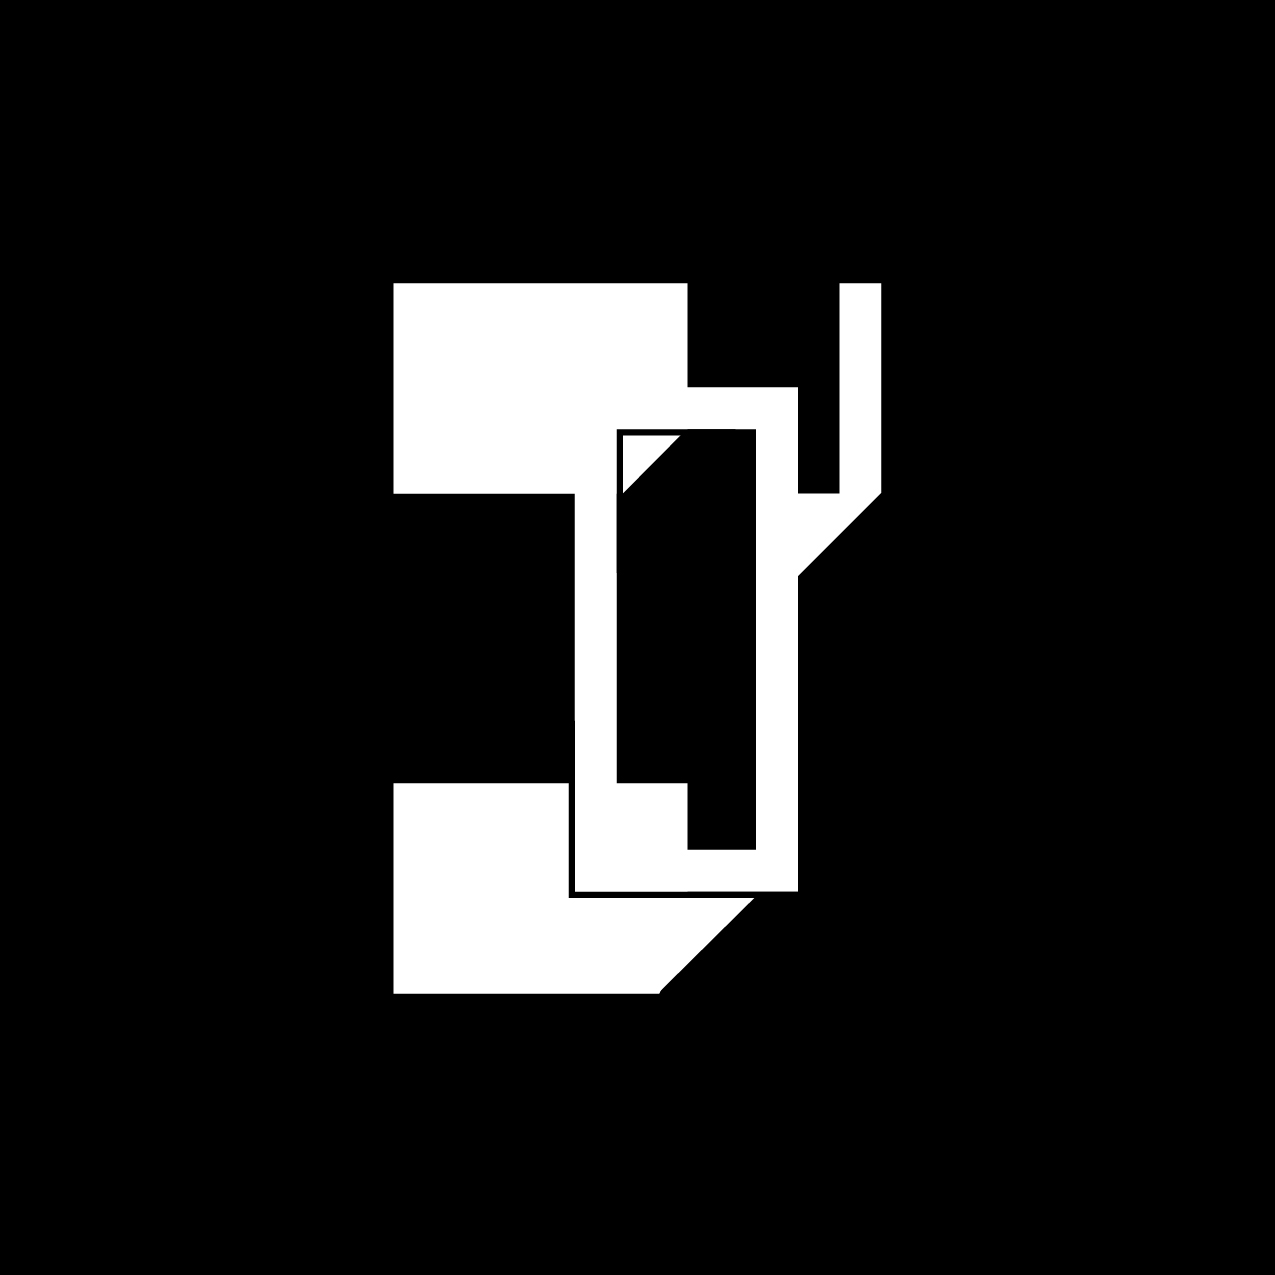 Letter J11 Design by Furia